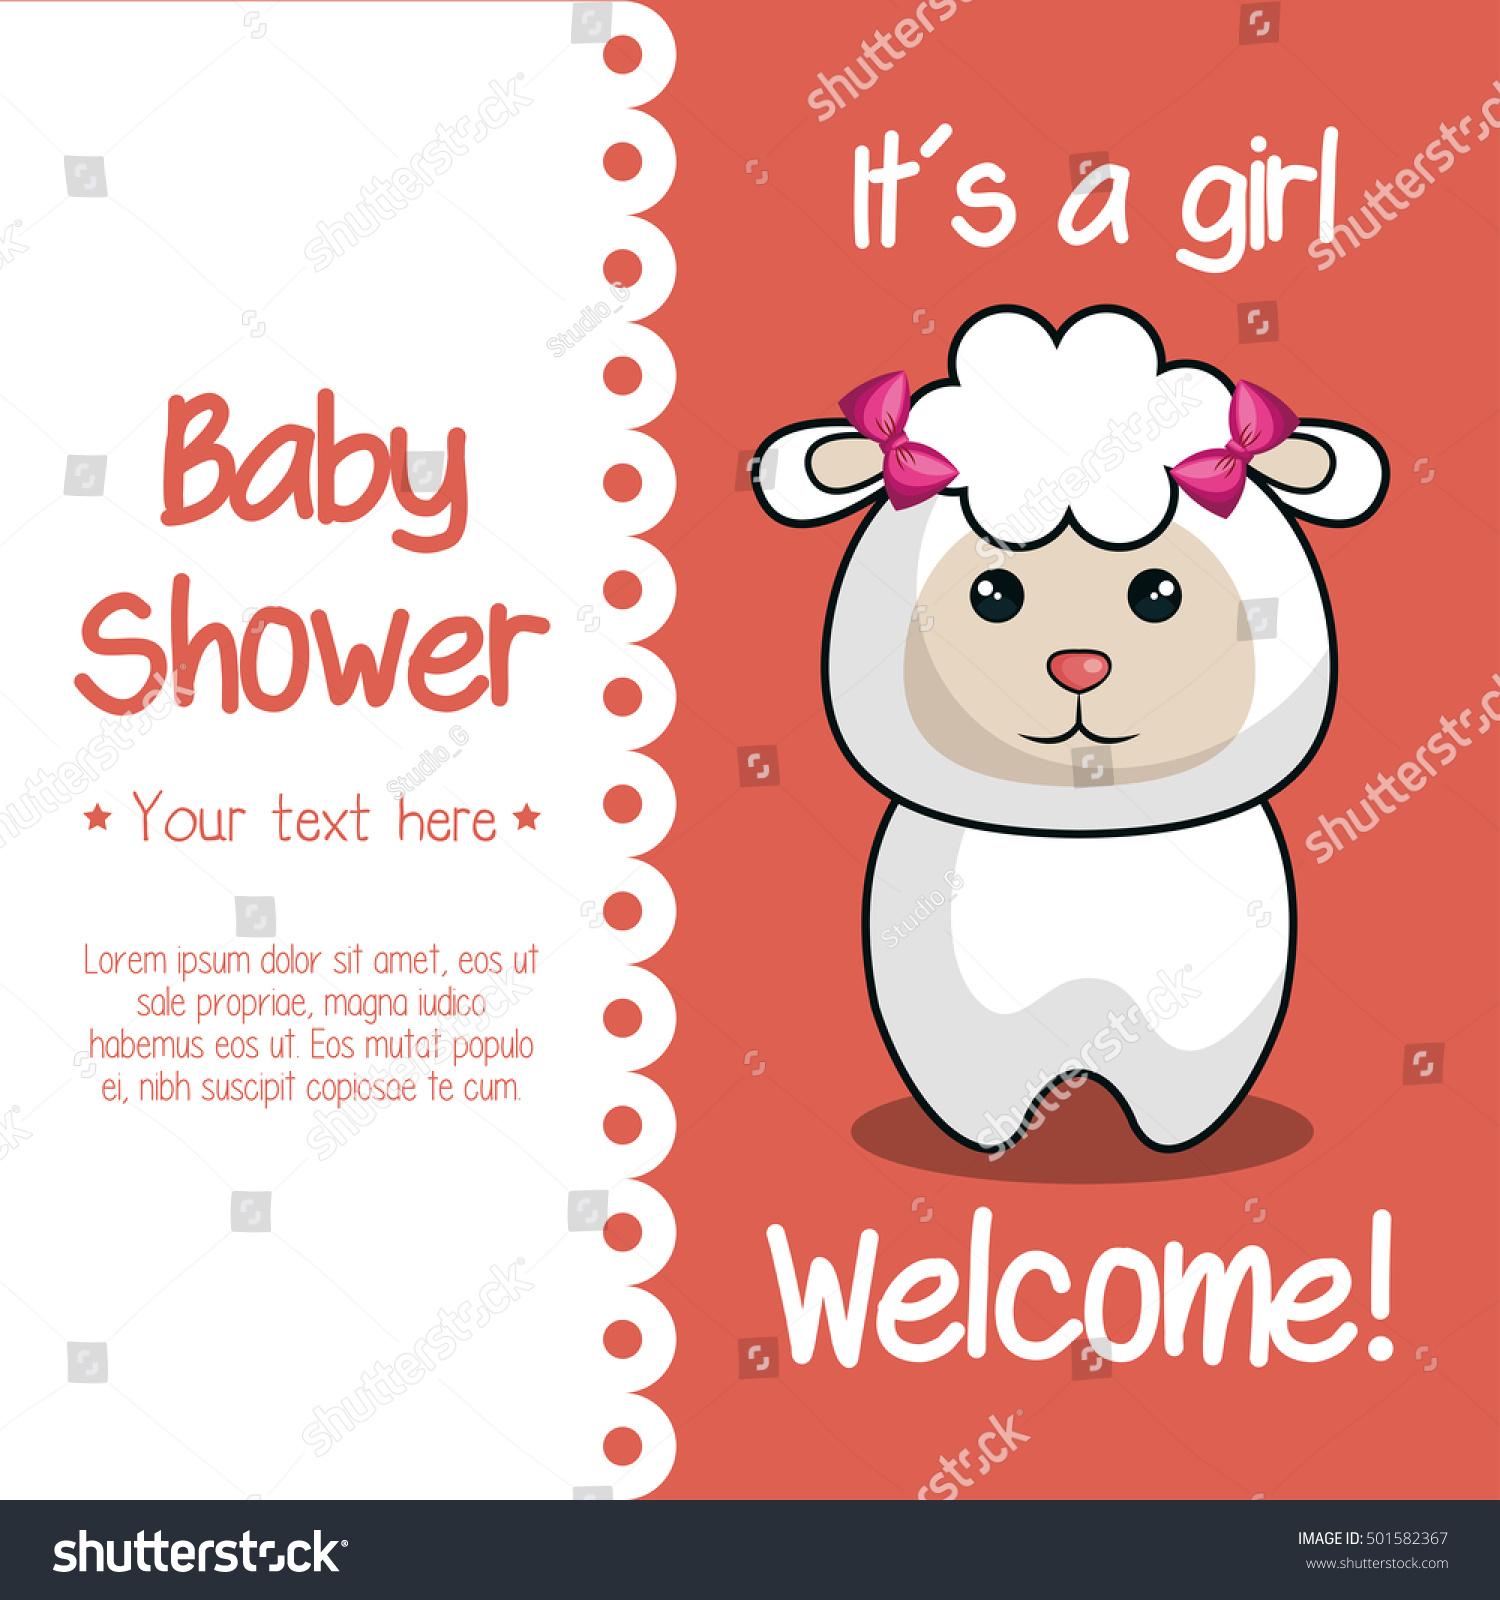 Baby Shower Invitation Cute Animal Stock Vector 501582367 - Shutterstock